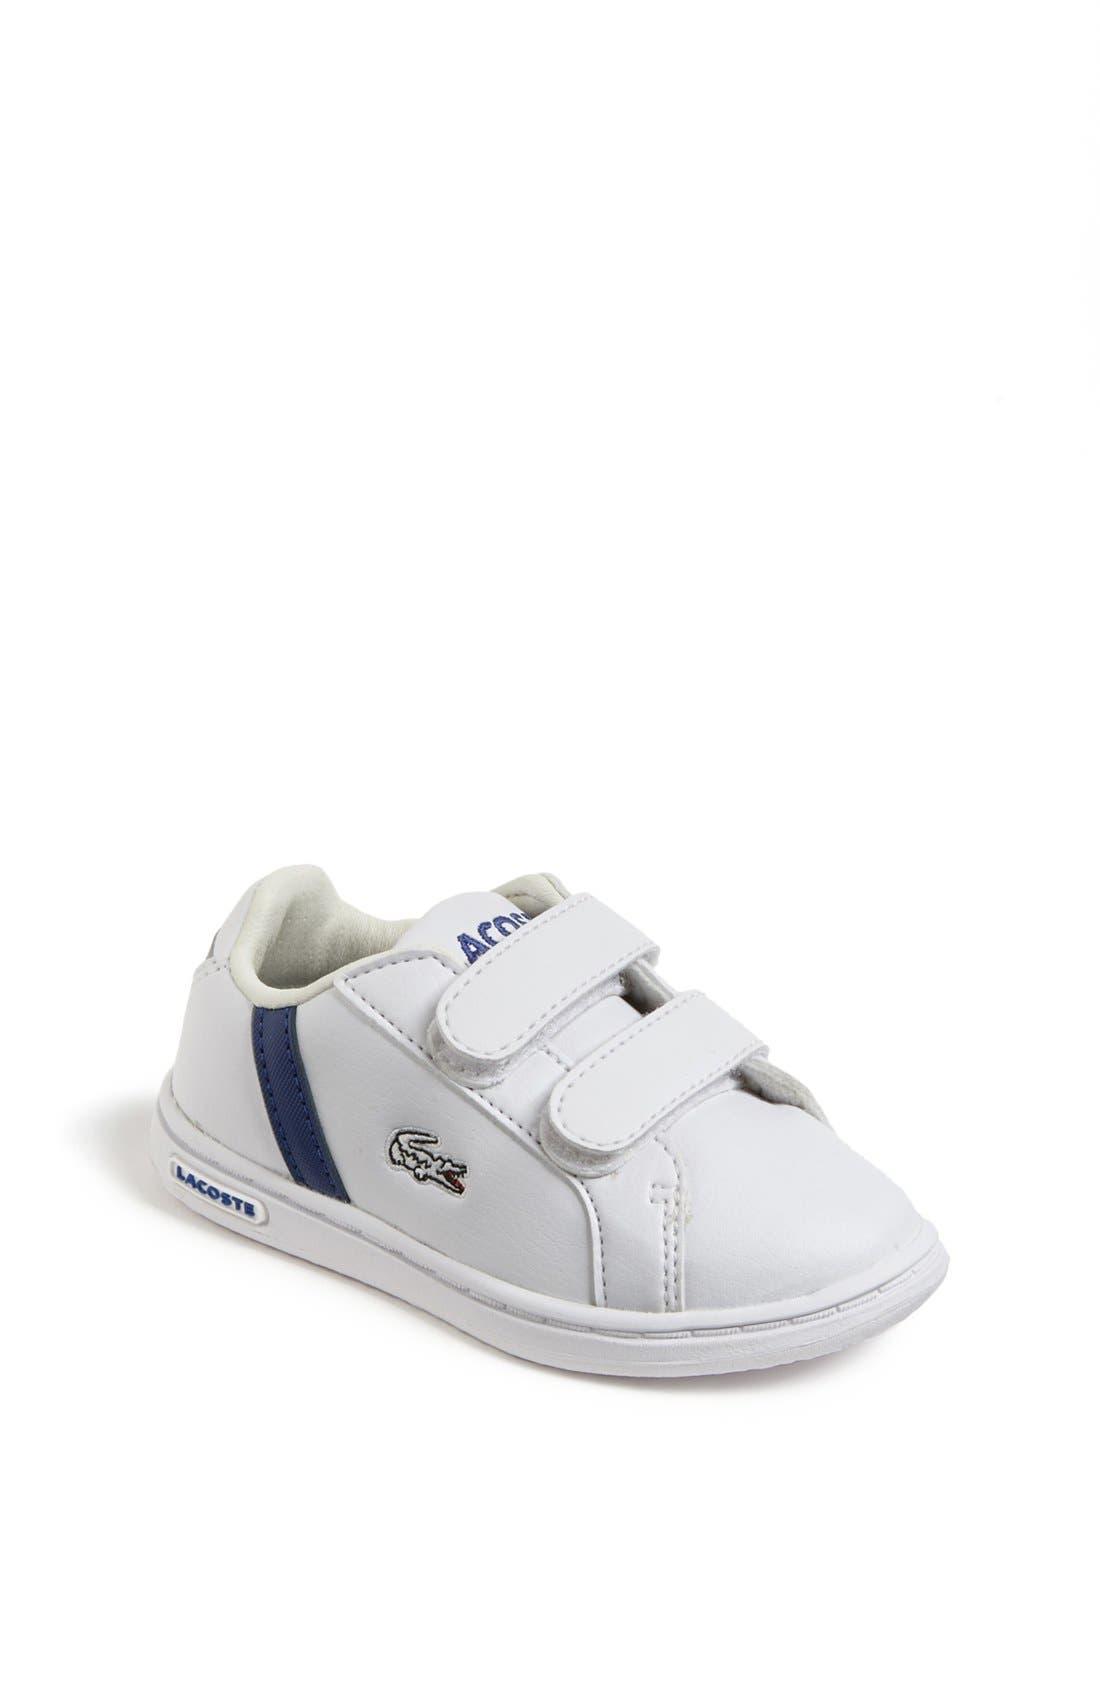 Main Image - Lacoste 'Renard' Sneaker (Baby, Walker & Toddler)